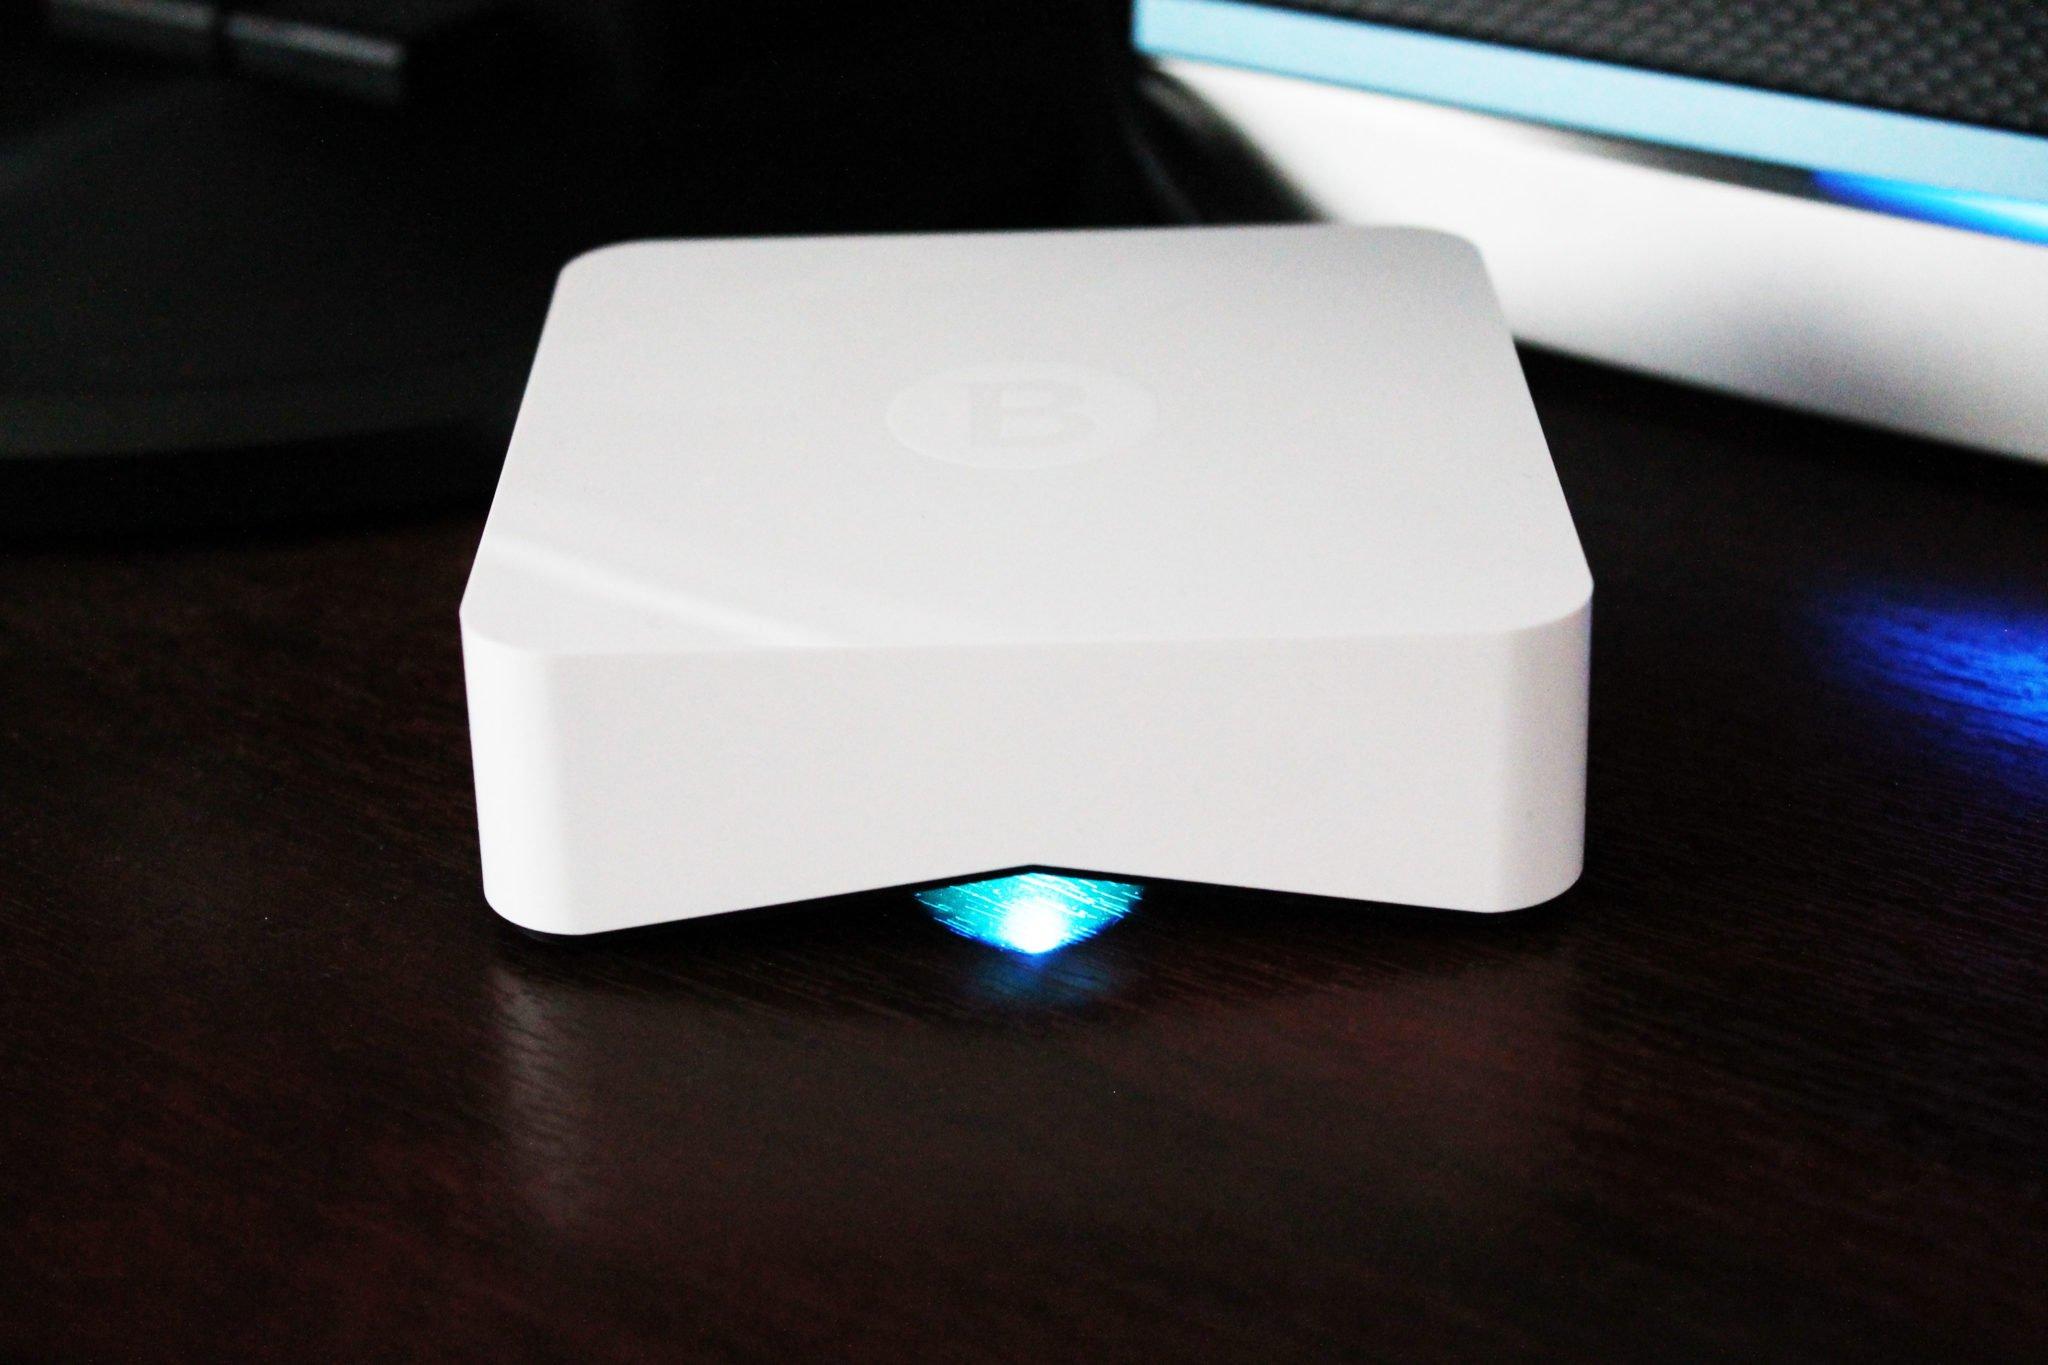 bitdefenderbox-front-facing